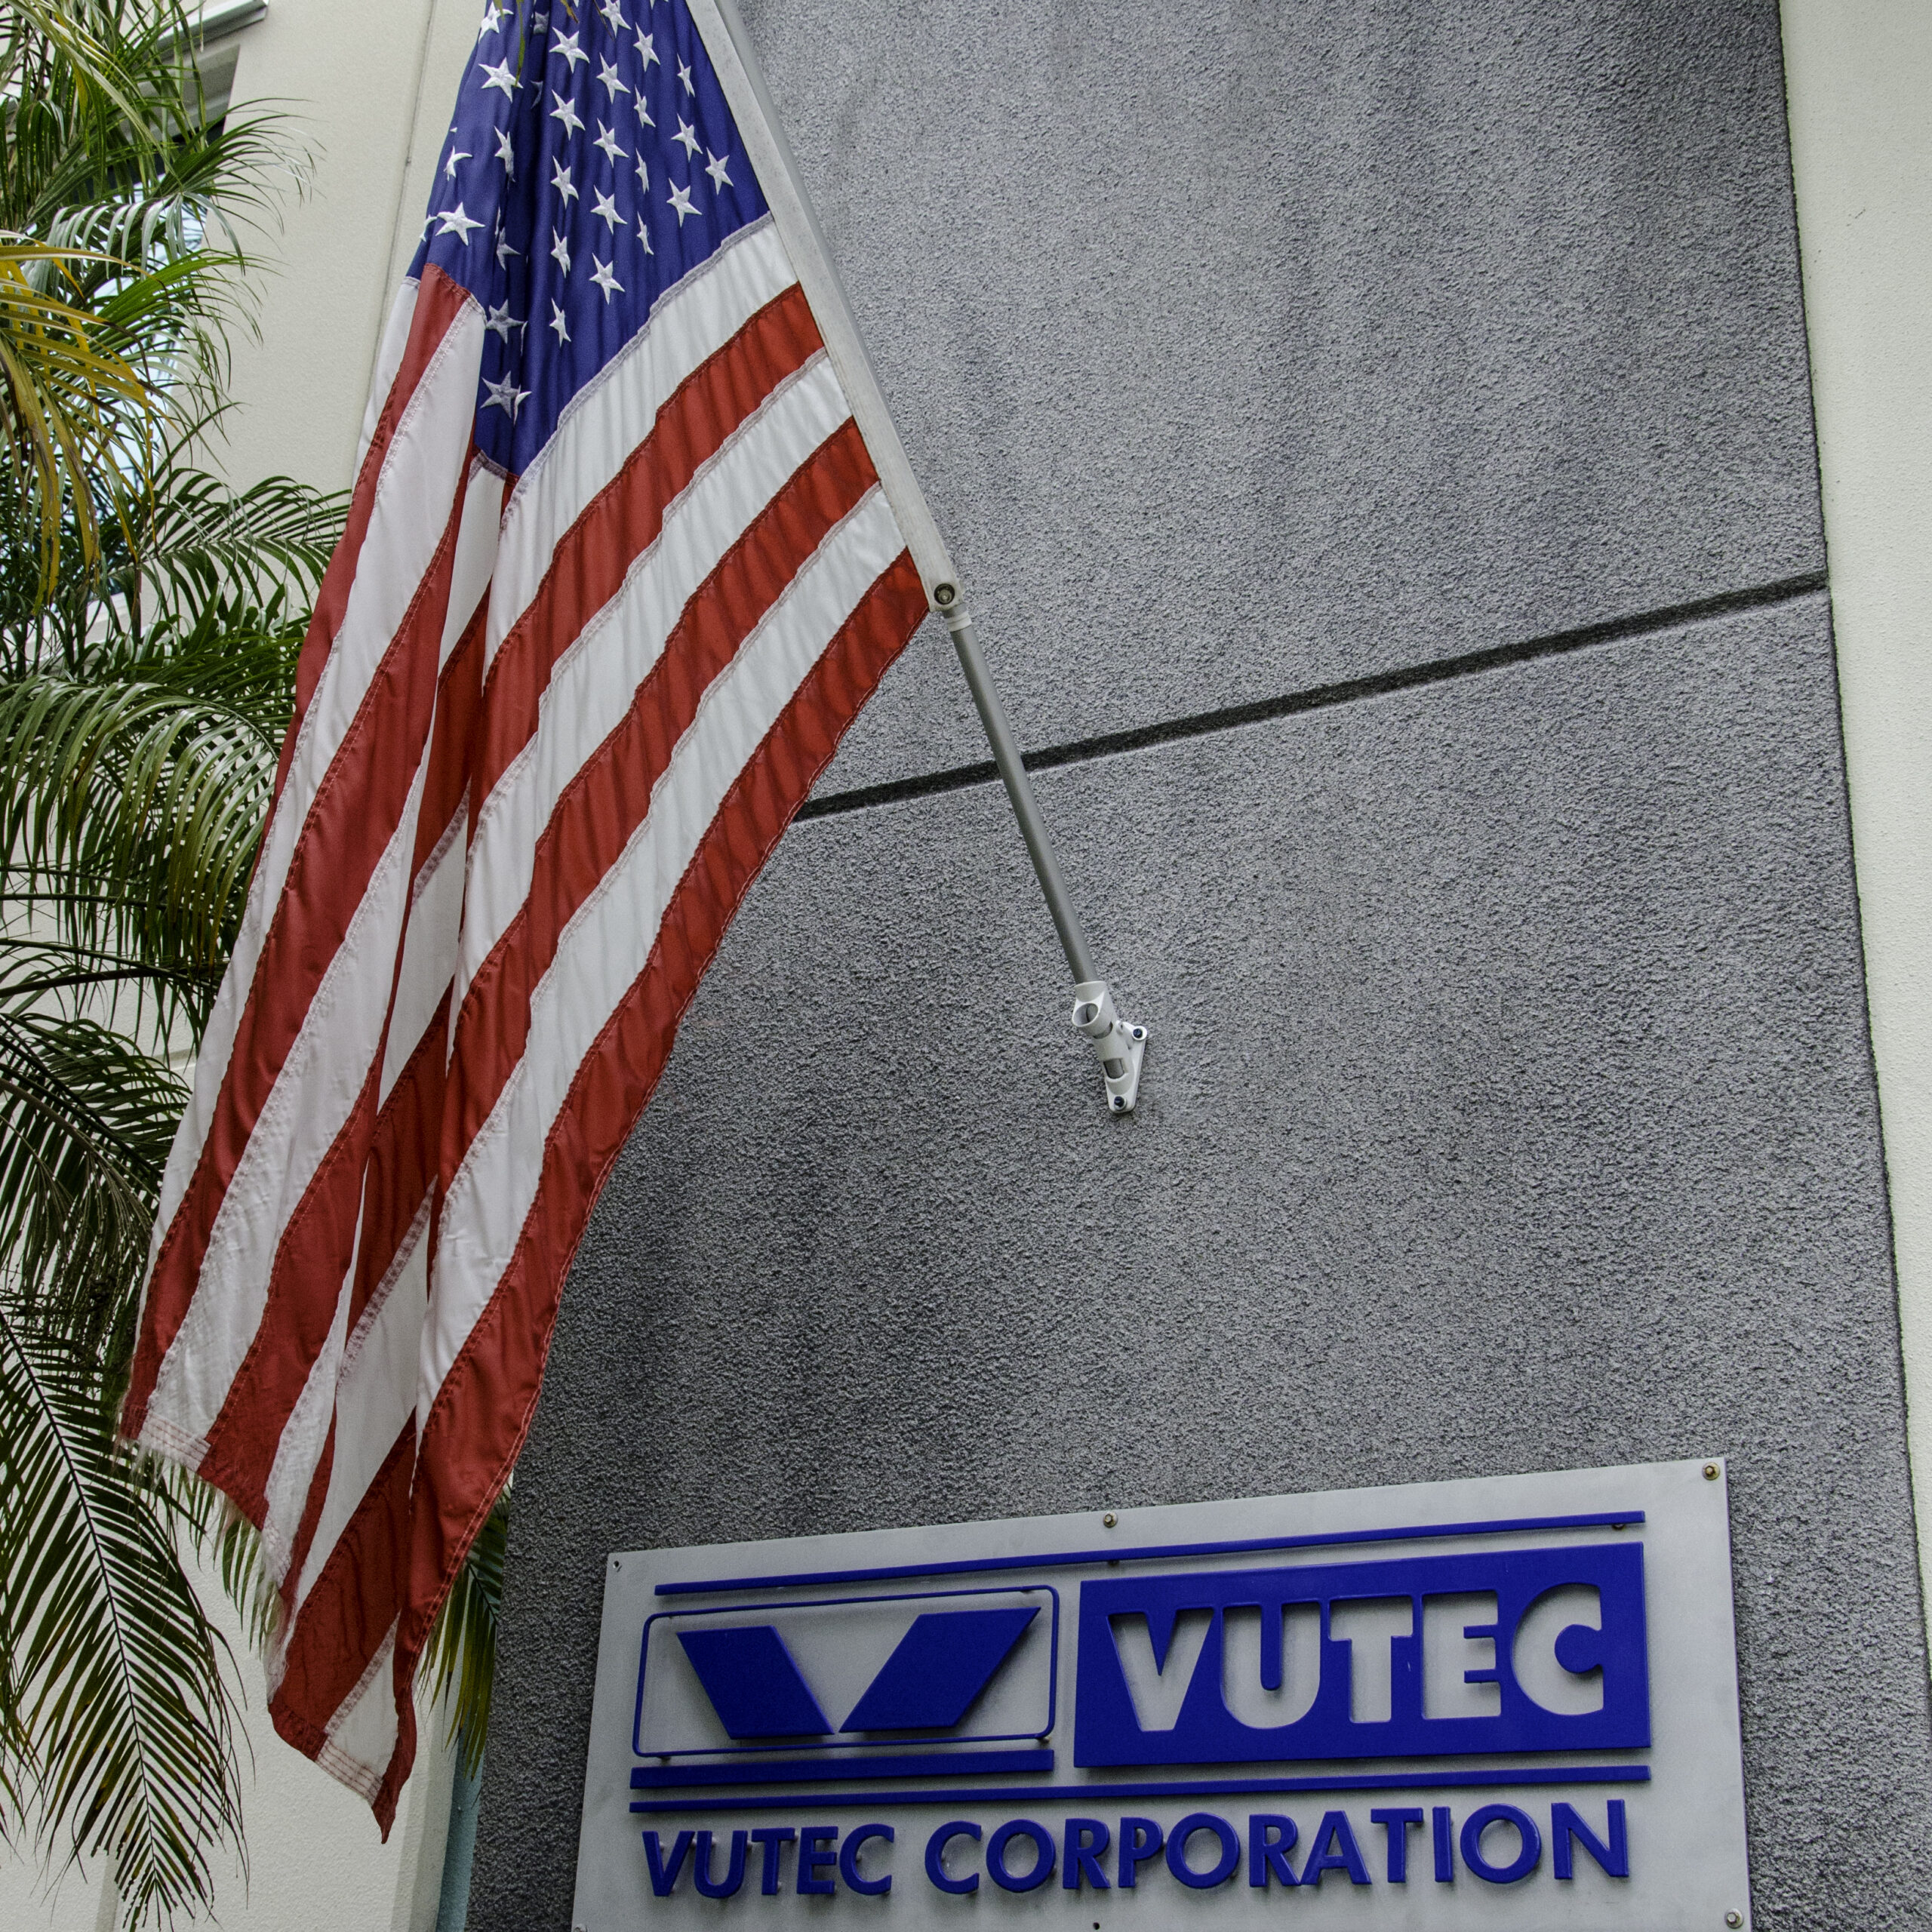 Vutec & American Flag